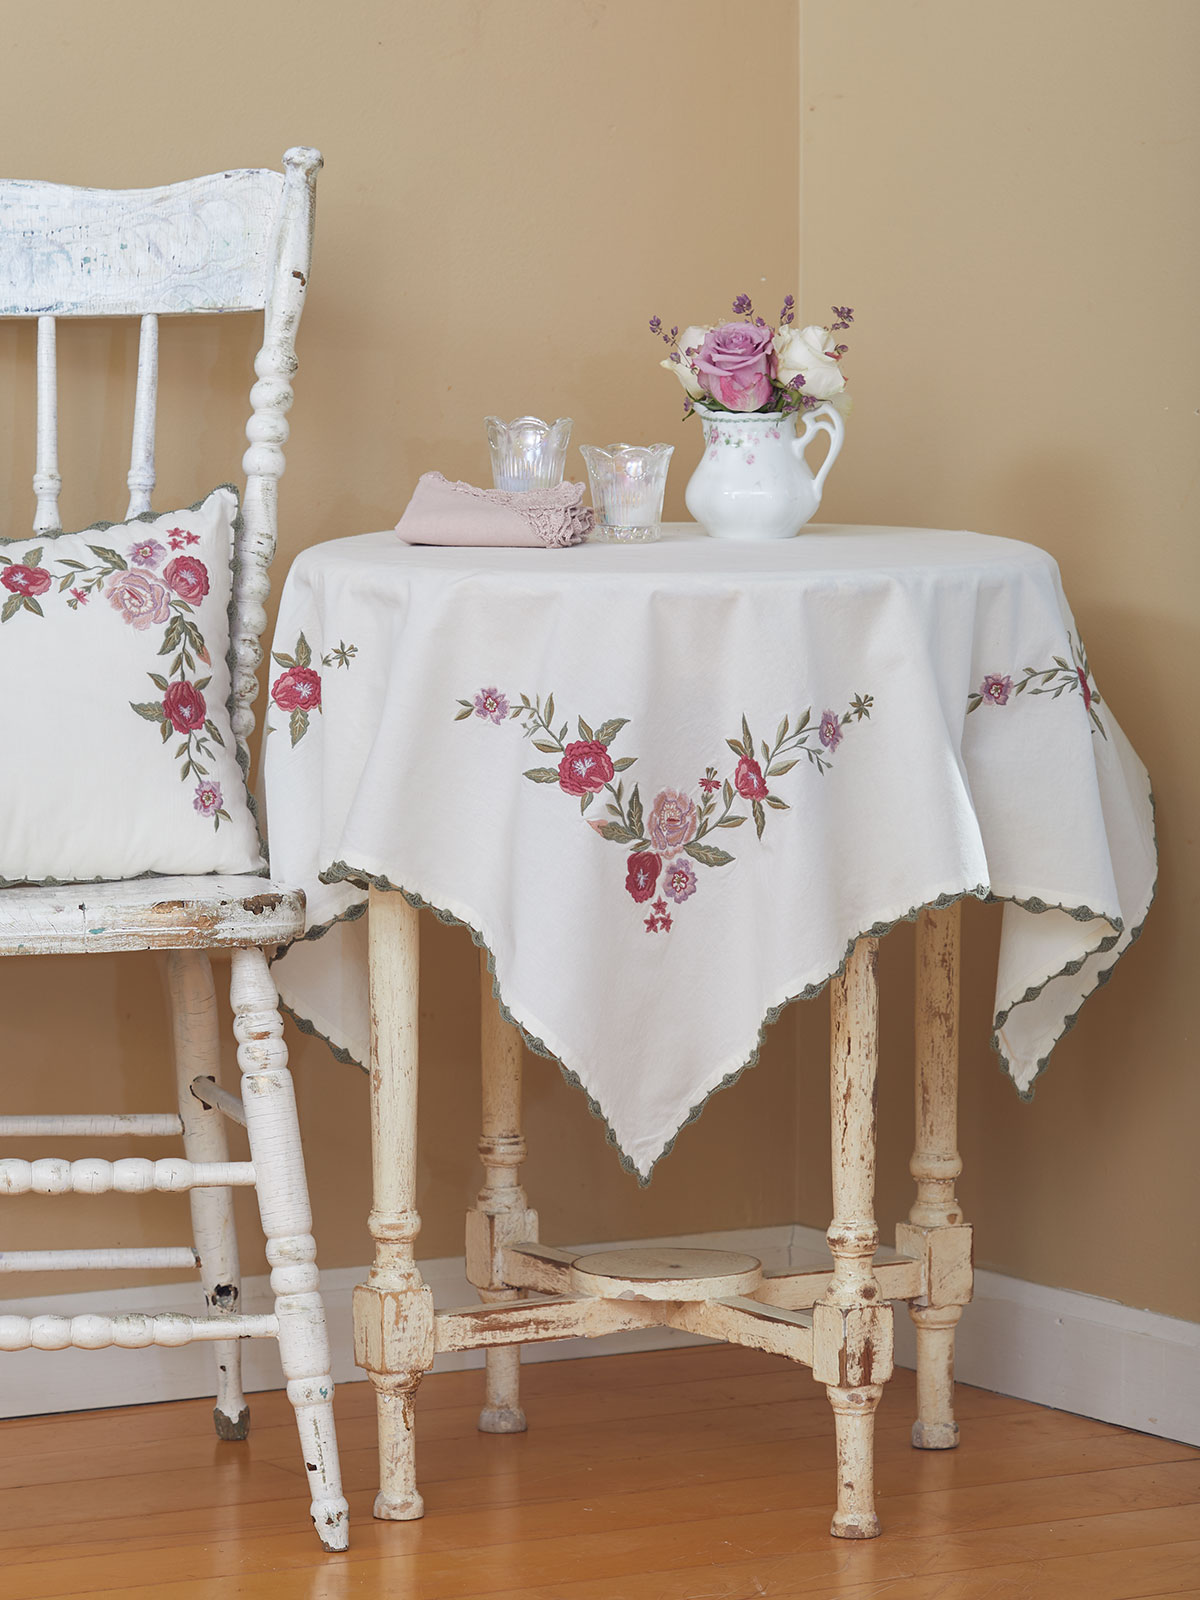 Keepsake Embroidered Tablecloth